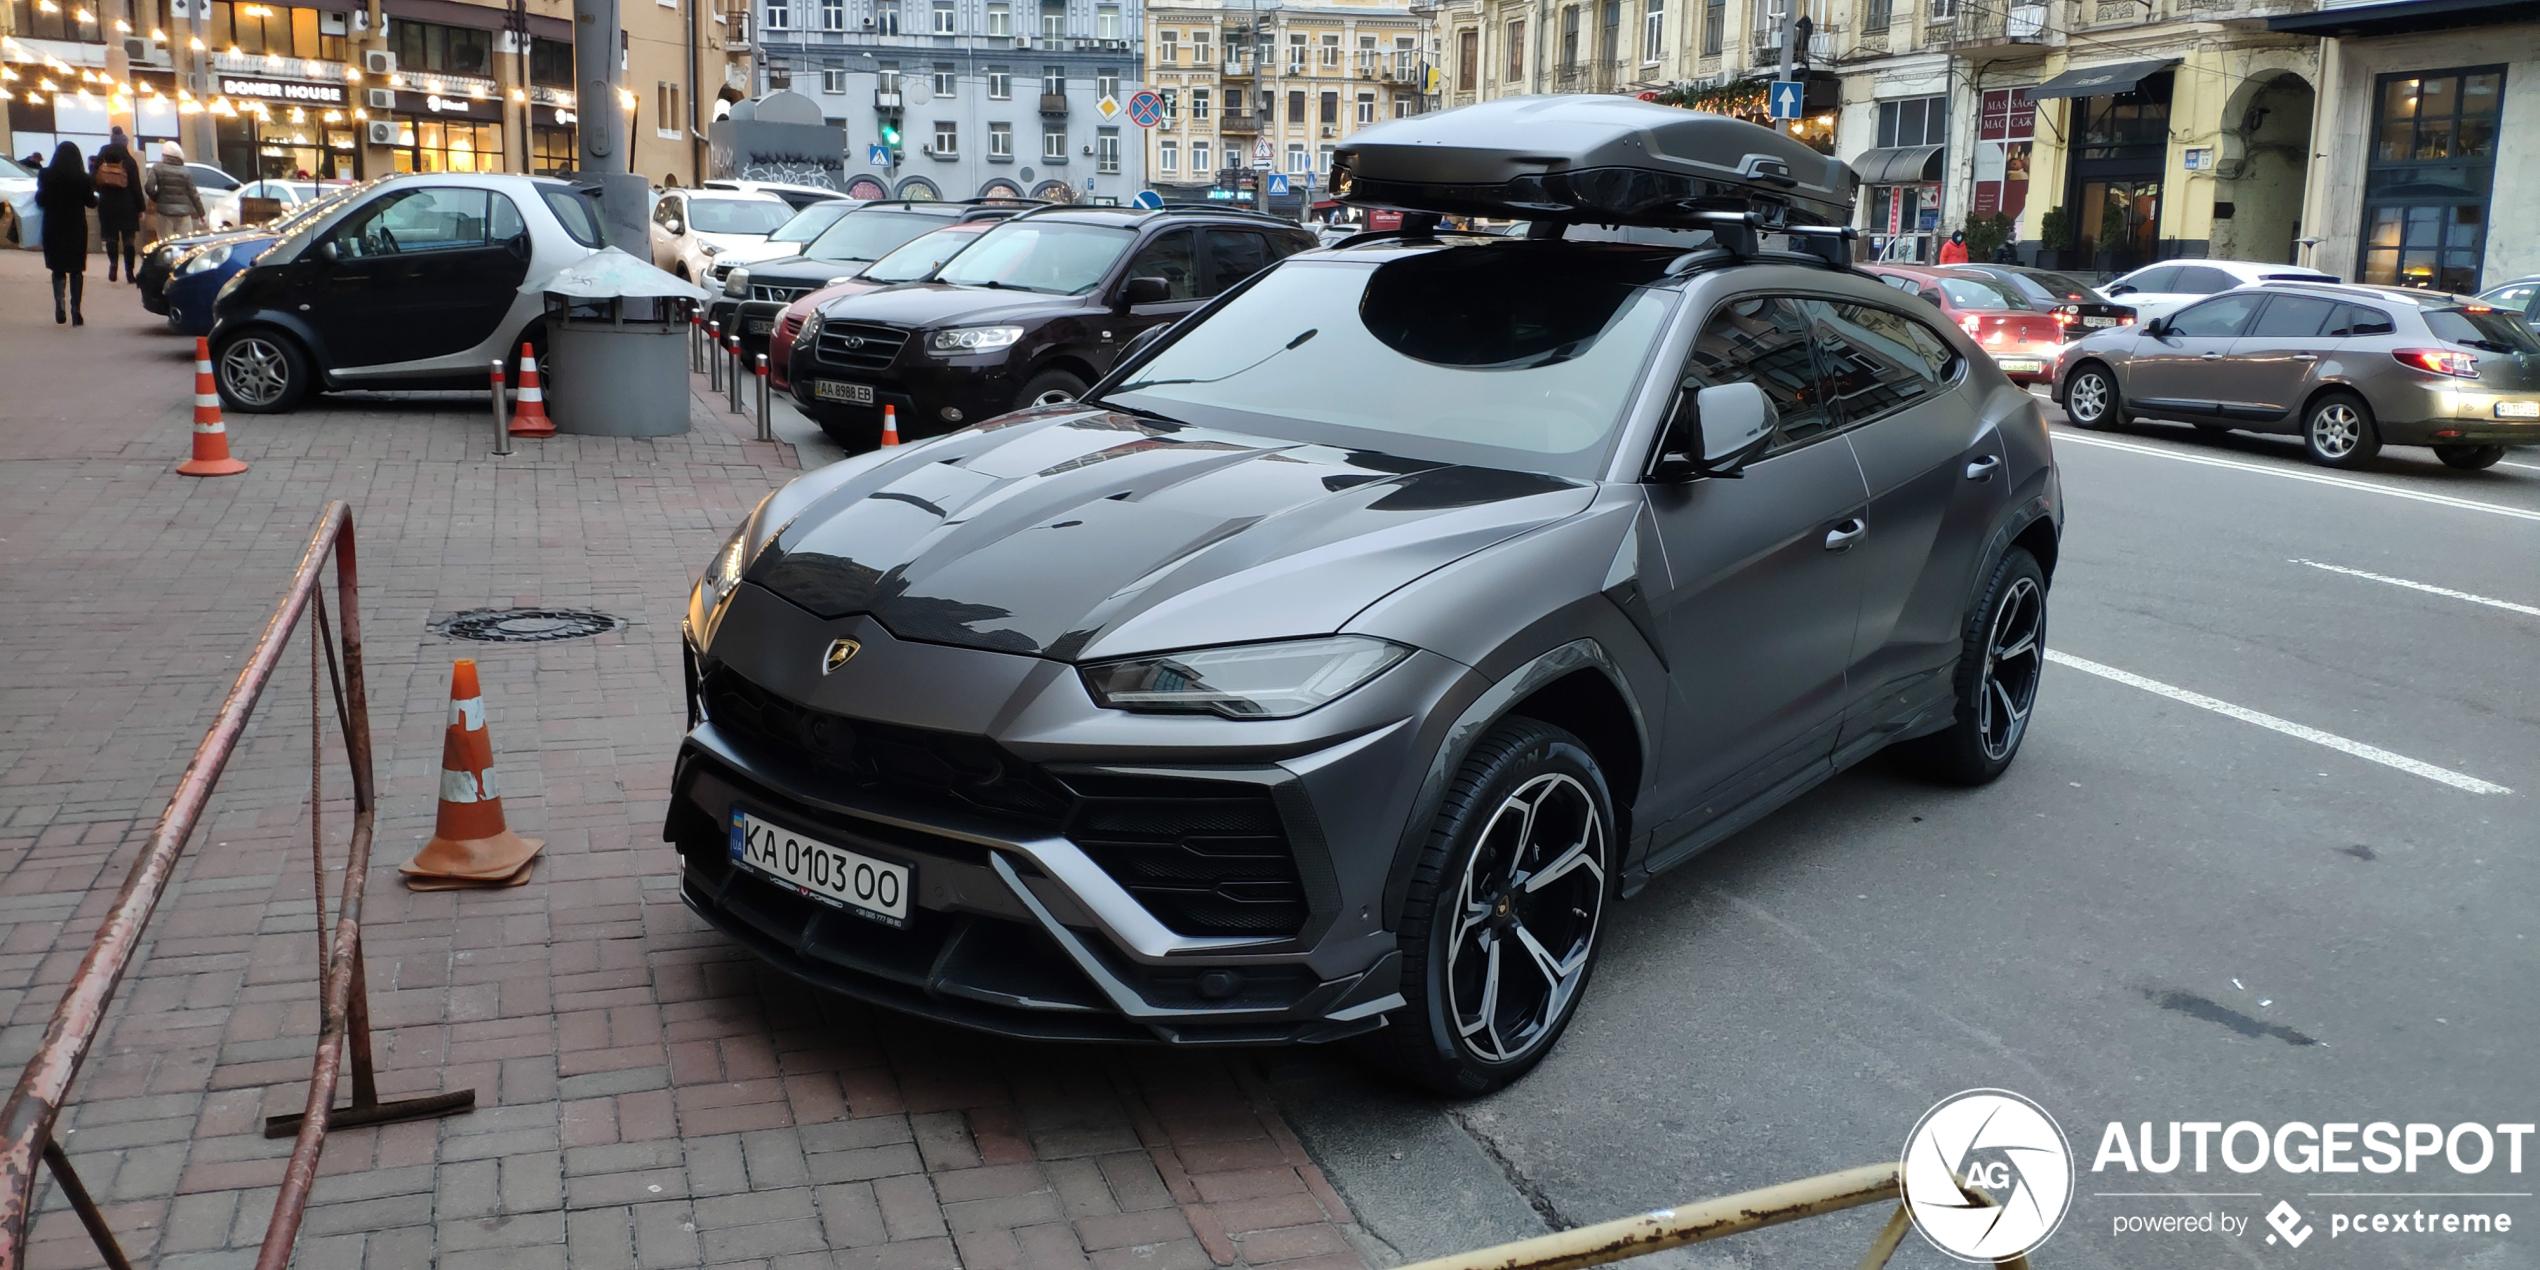 Lamborghini Urus Topcar Design valt lekker op